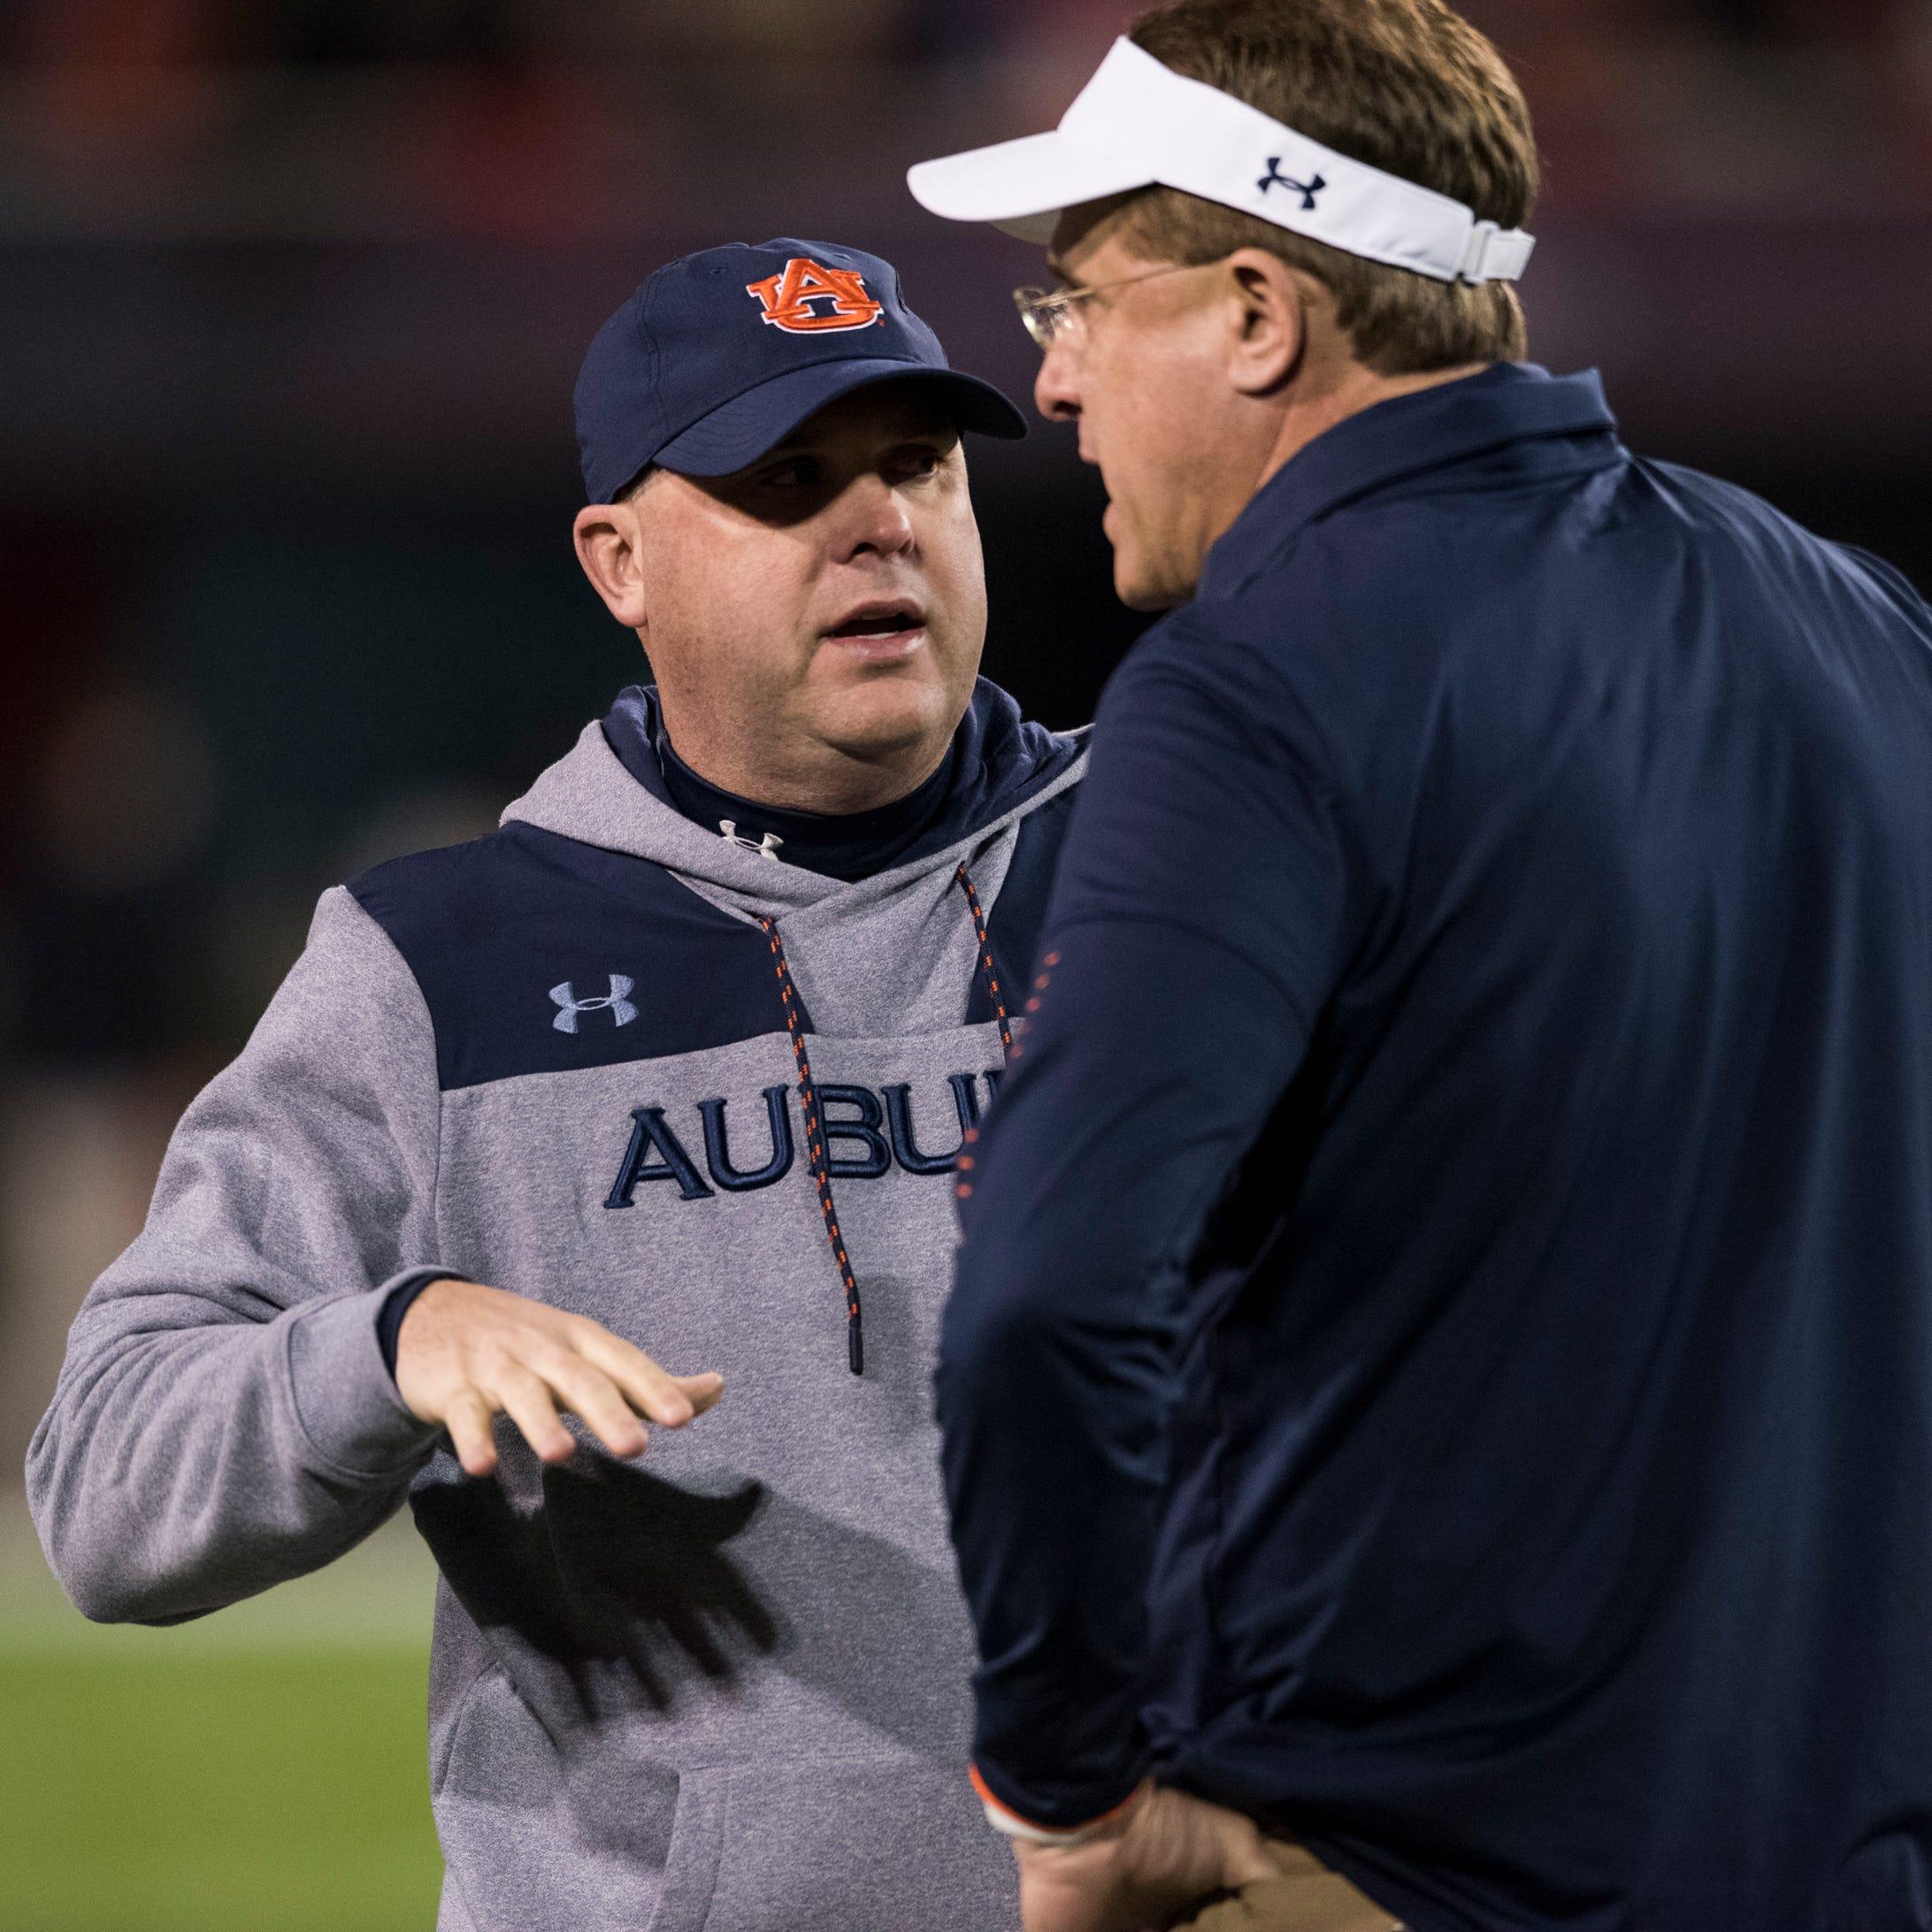 Reports: Troy Trojans set on former Auburn OC Chip Lindsey as next coach